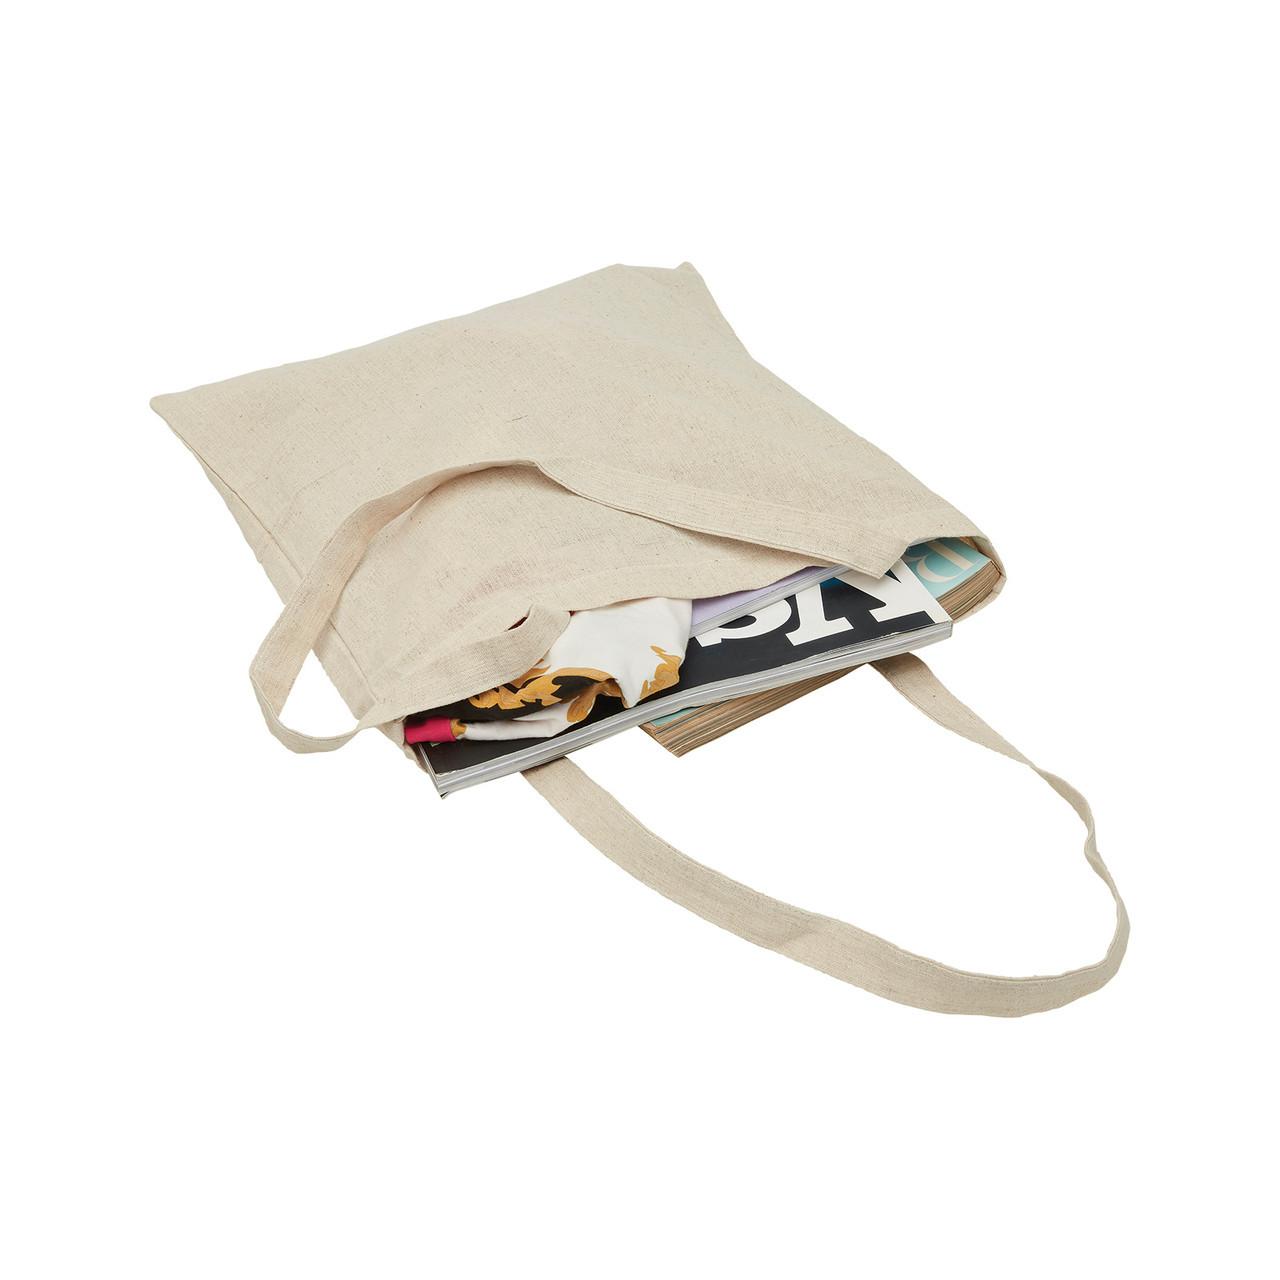 Hemp Cotton Tote Shopping Bag Buy Online Plain Shopper Carry Bags